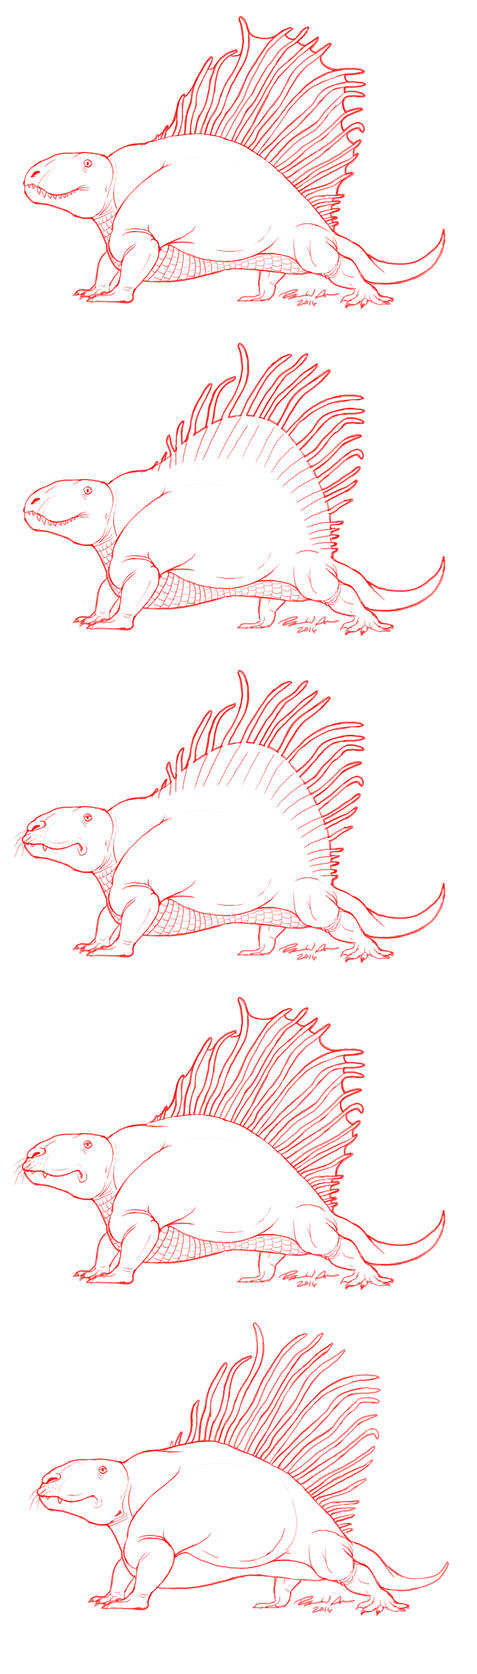 Different Takes on Dimetrodon by raven-amos